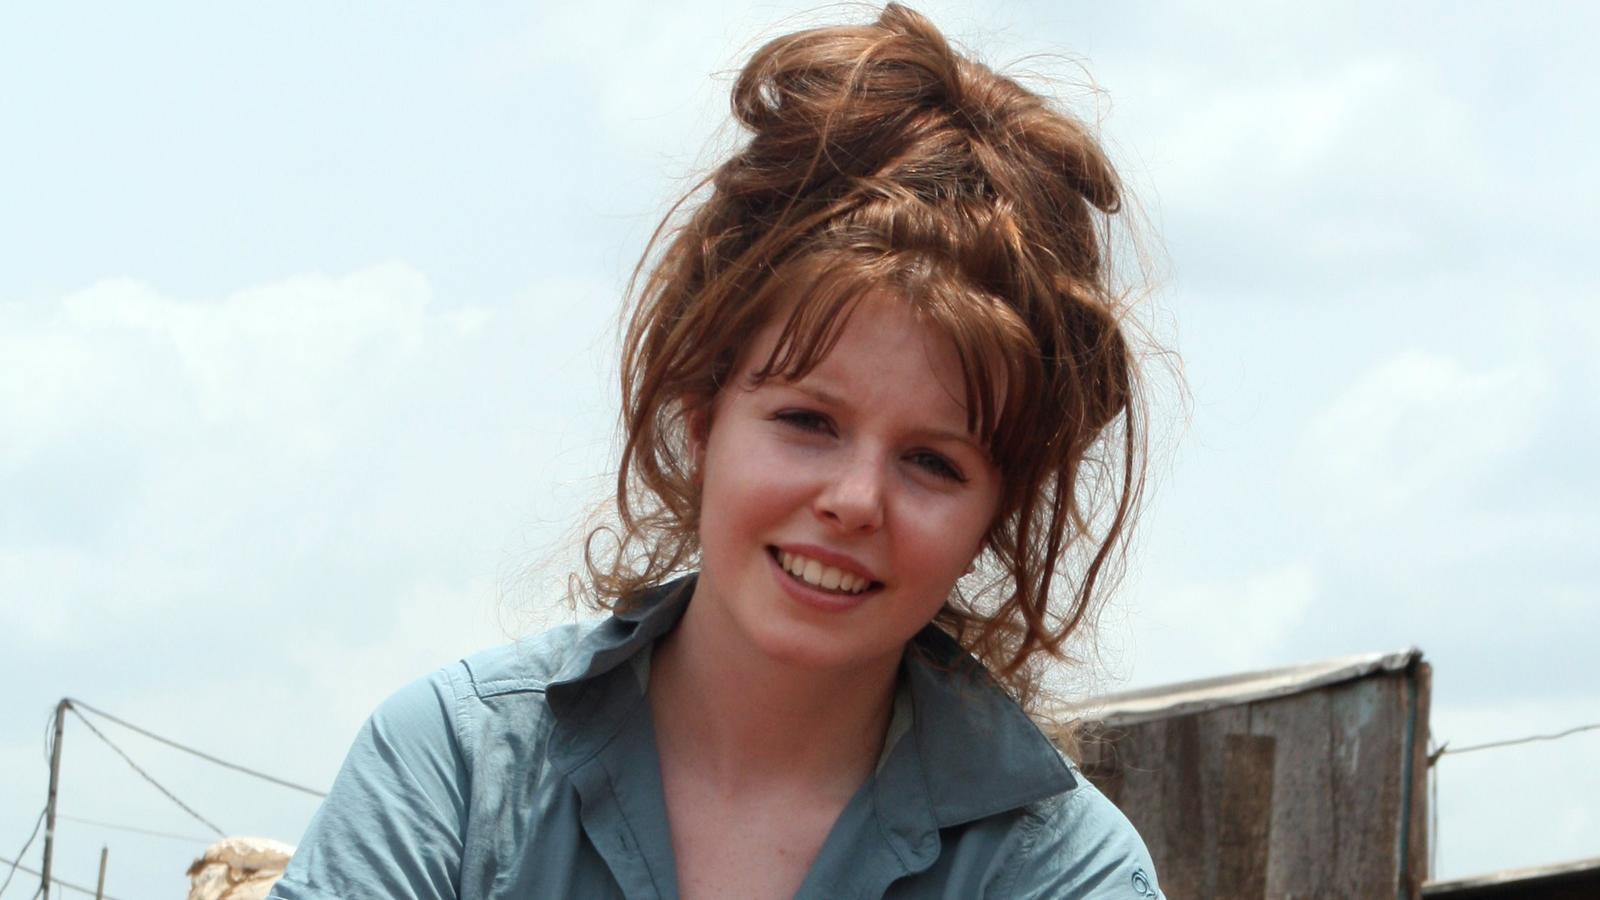 Stacey Dooley: Stacey Dooley Investigates